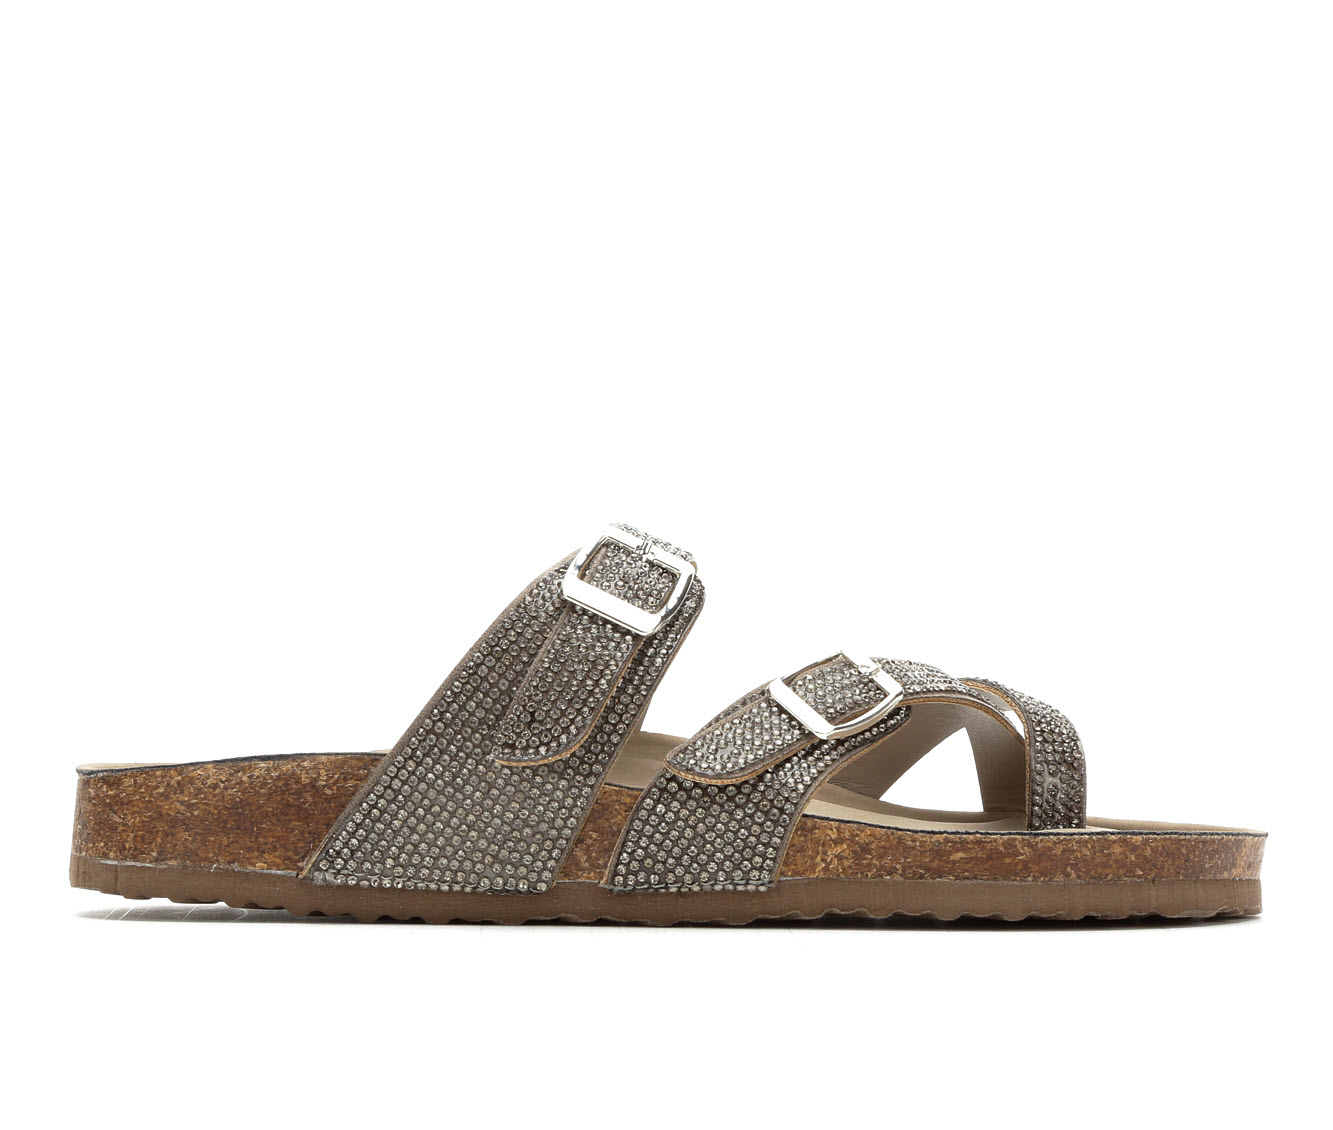 Madden Girl Bryceee Women's Sandal (Gray Faux Leather)